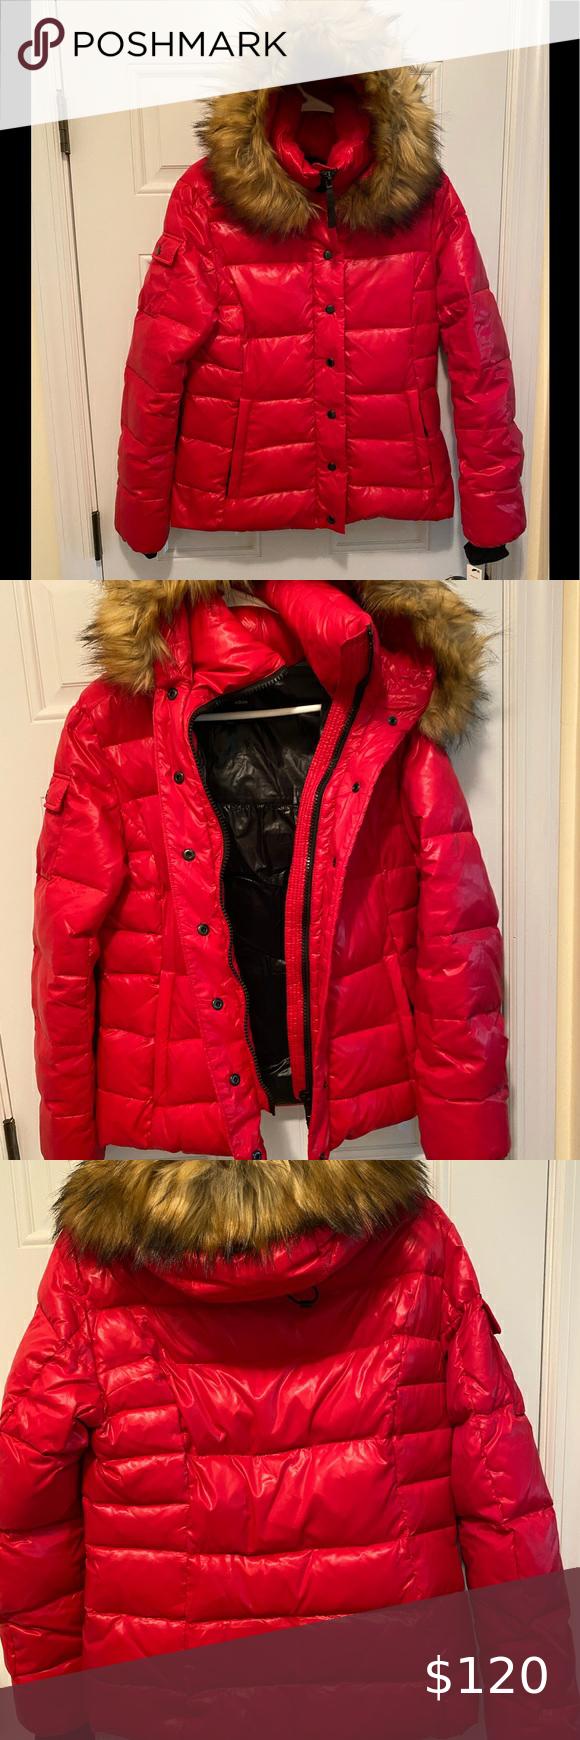 Puffer Jacket With Fur Trim Hood Aqua Red Size M Puffer Jacket With Fur Red Puffer Jacket Clothes Design [ 1740 x 580 Pixel ]